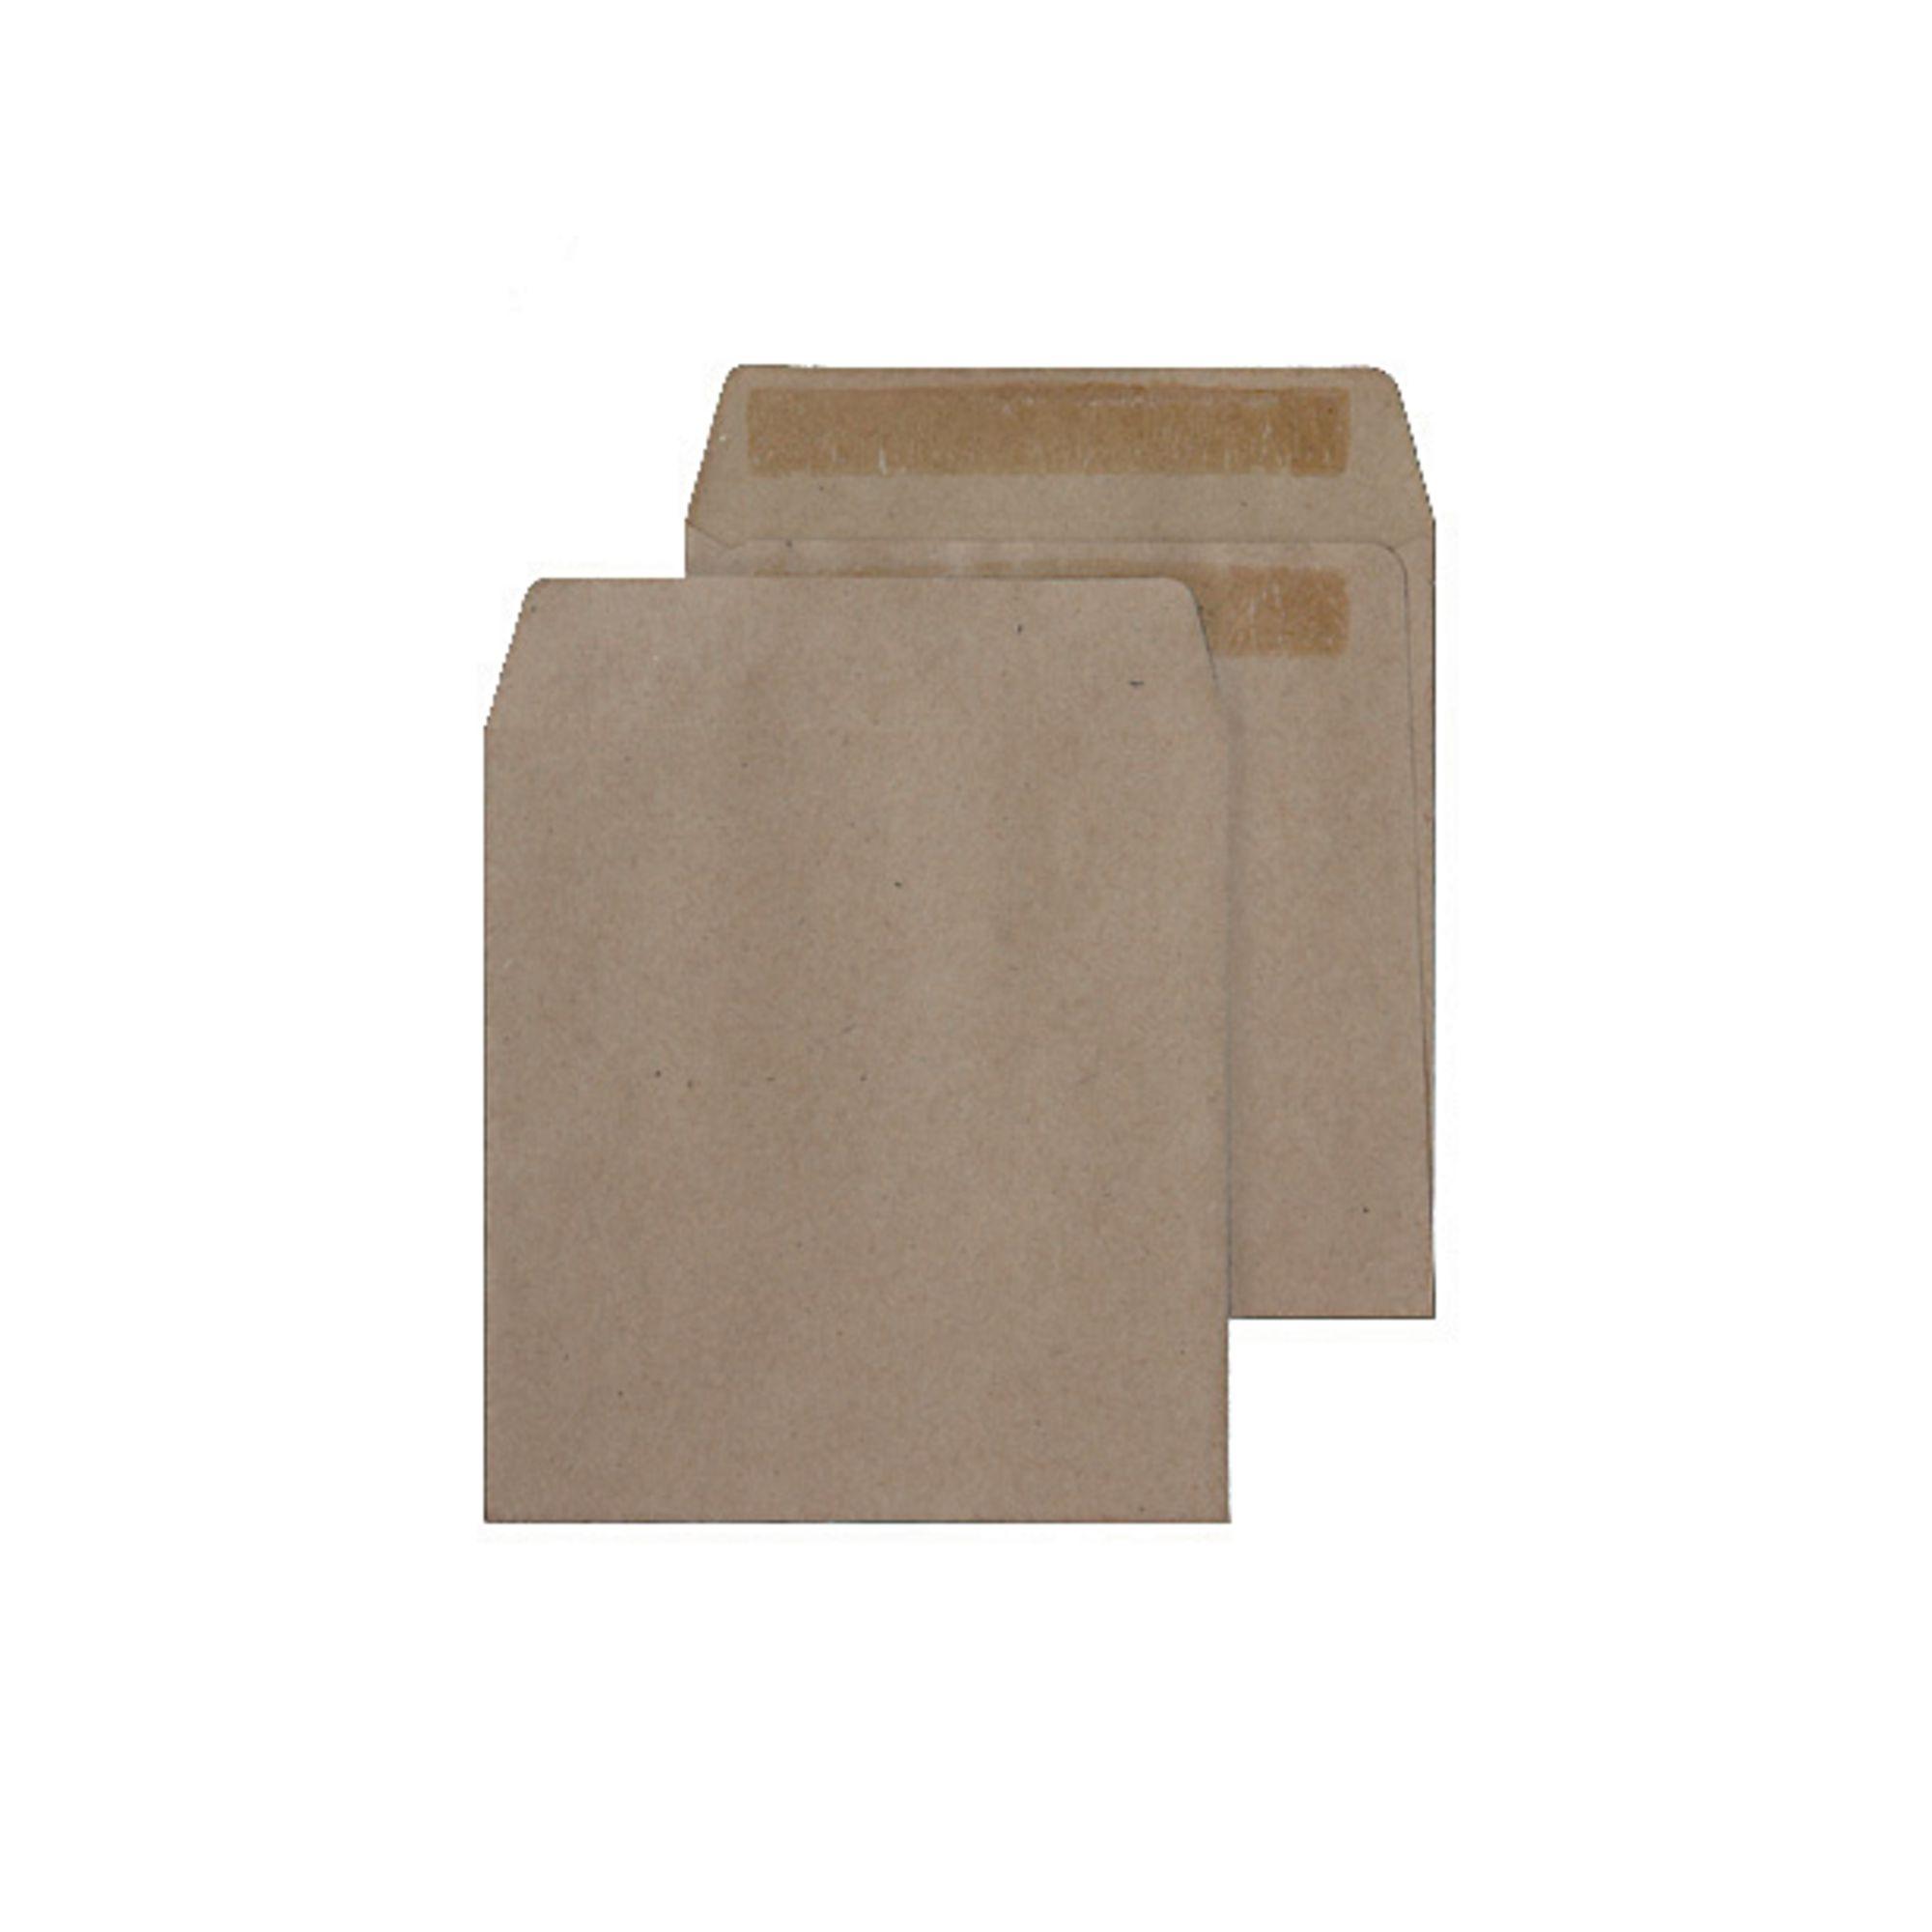 Envelopes 108X102mm Buff Gummed Pocket Pk1000